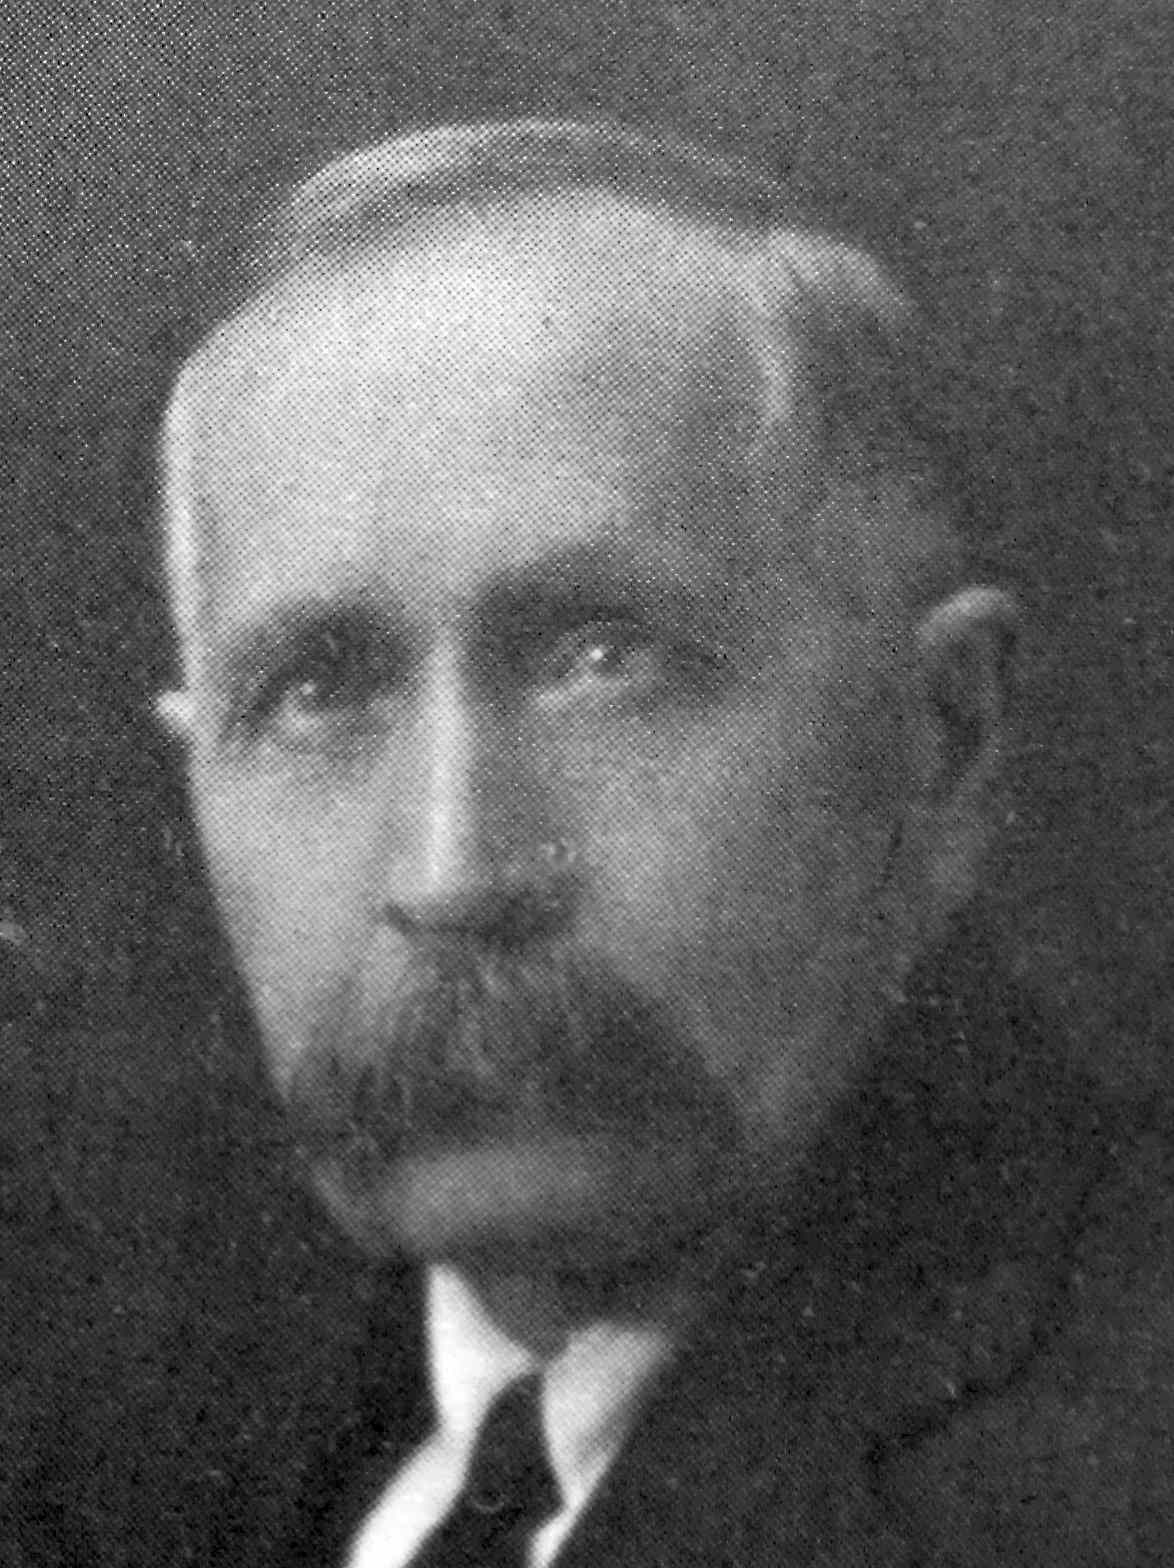 Andersen, Niels Peter